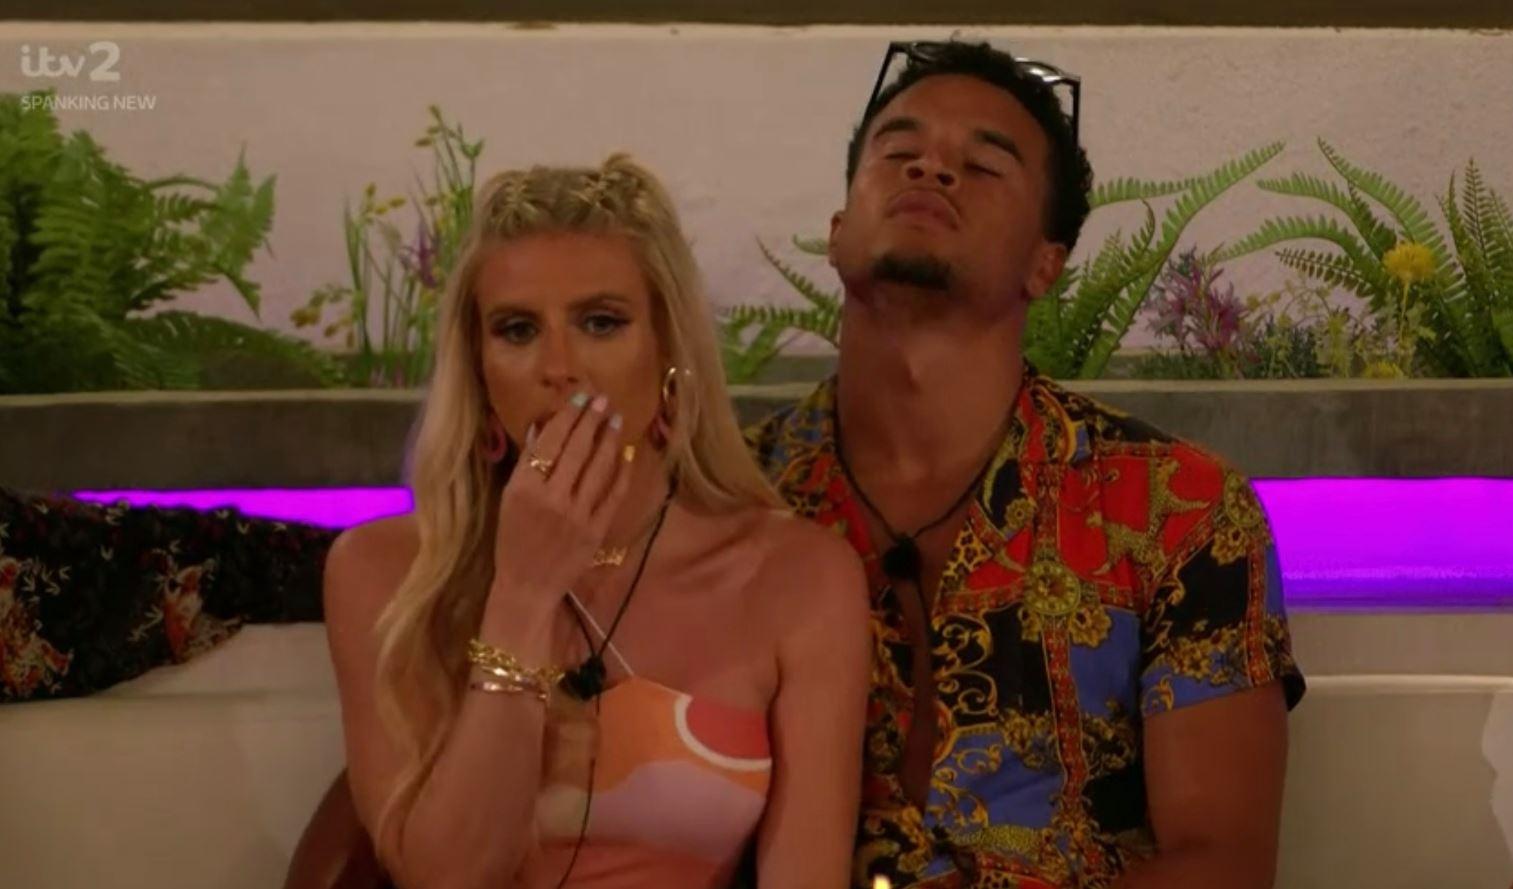 Preview and Recap of Love Island Season 7 Episode 25